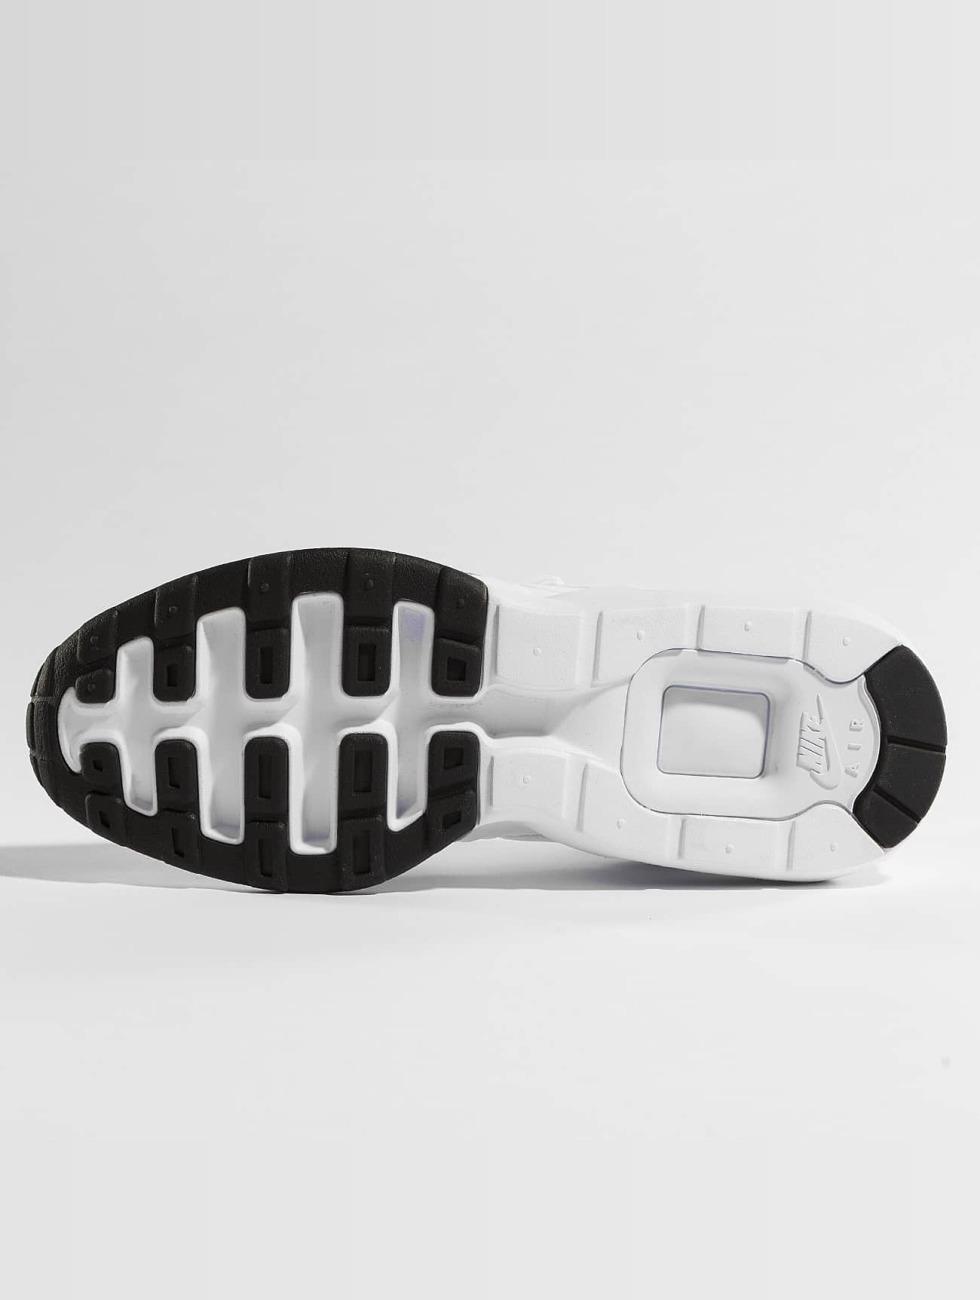 Nike Schoen / Sneaker Air Max Prime Sl I Vidd 422886 Billig Salg Pålitelig Orange 100% Opprinnelige Gratis Frakt Limited Edition Billig Nye Ankomst 1feOh7DeHQ